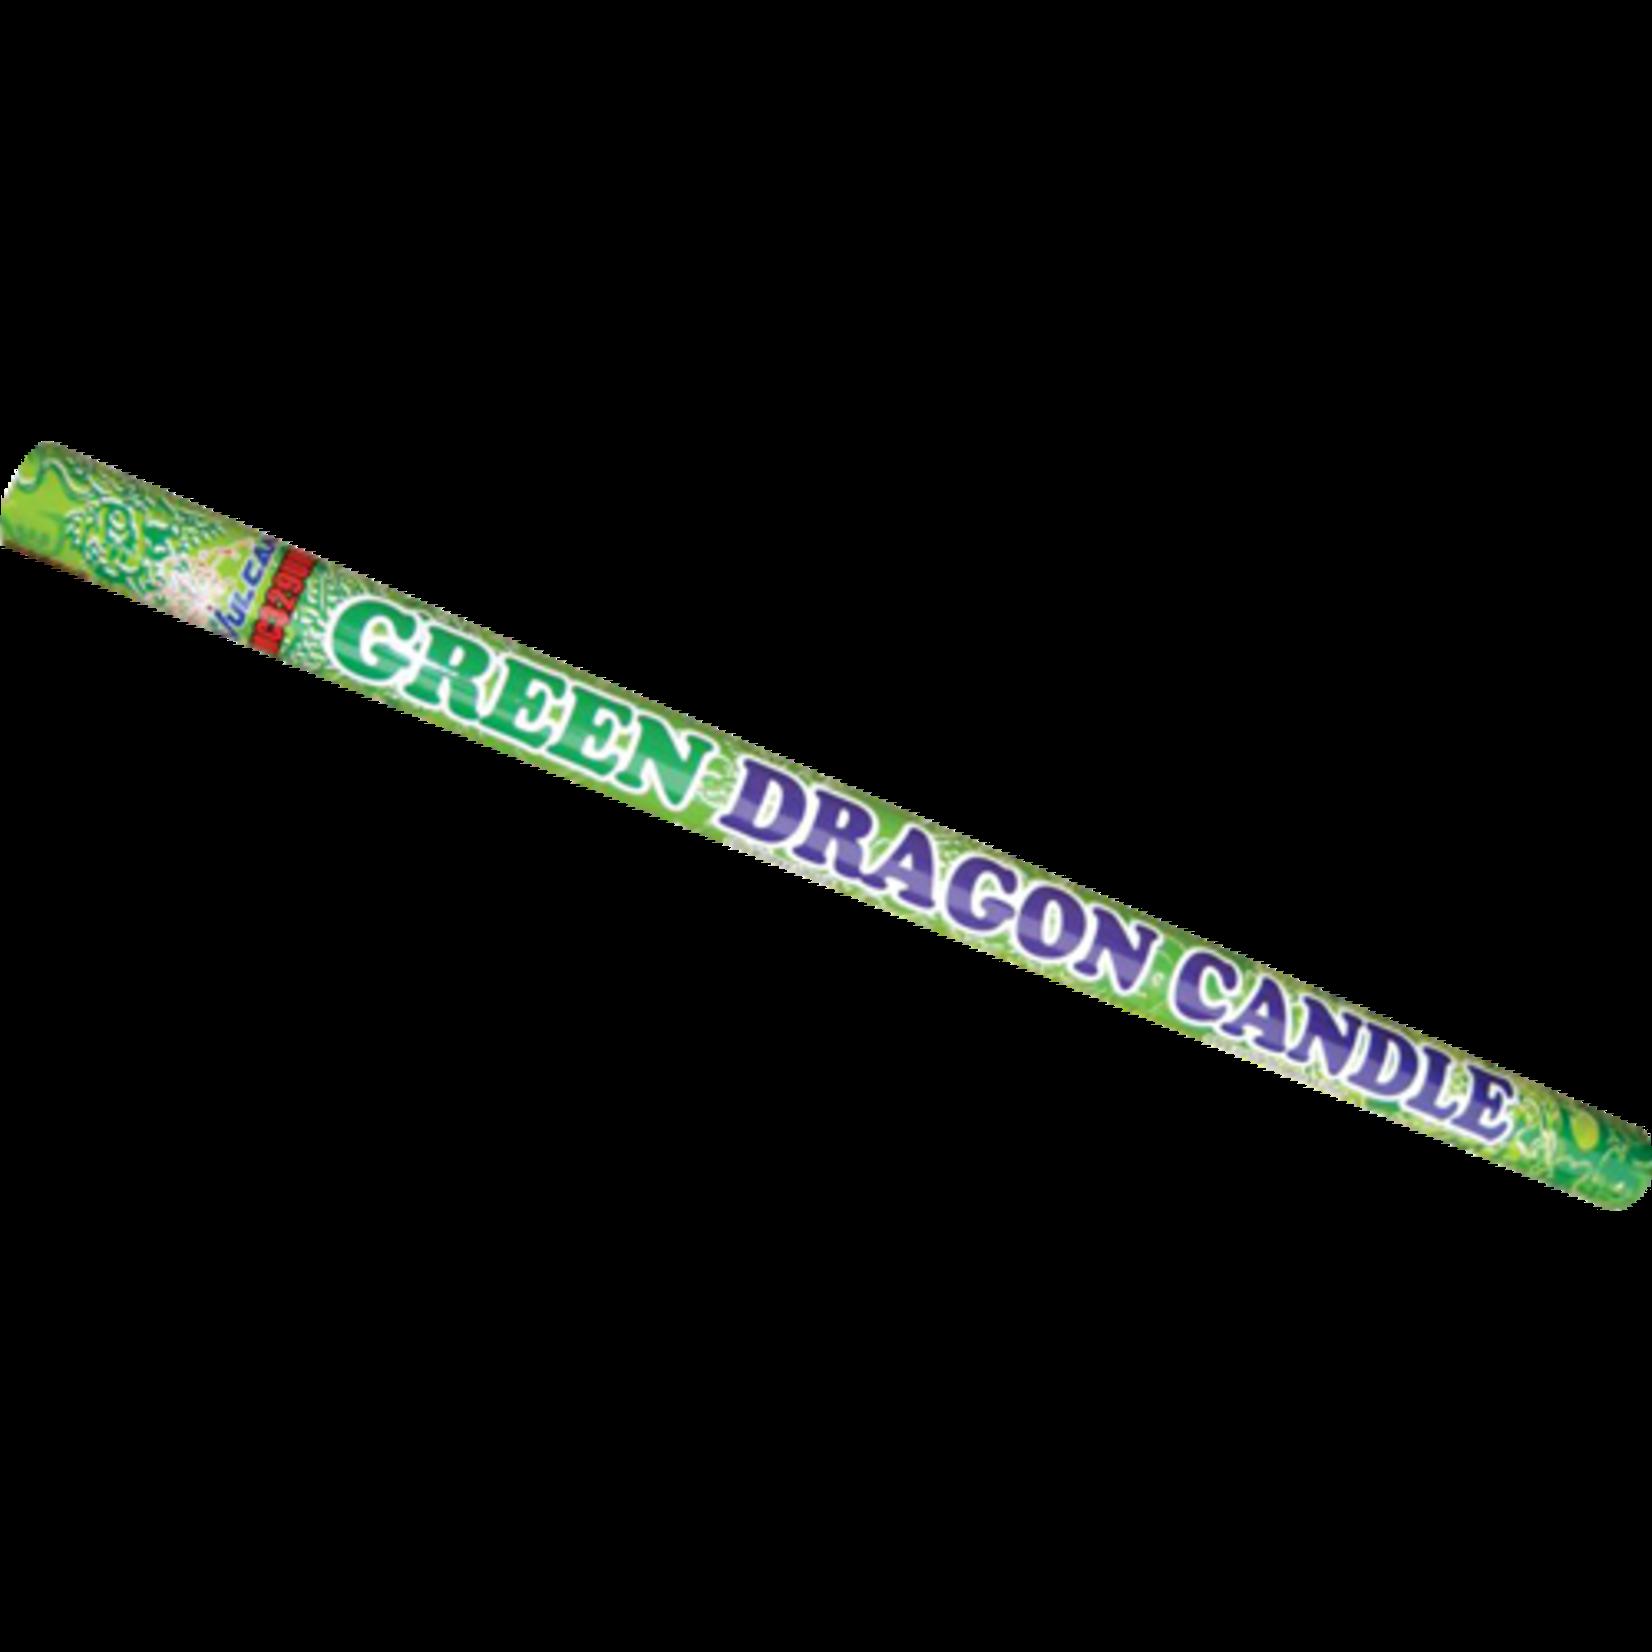 Green Dragon Candle